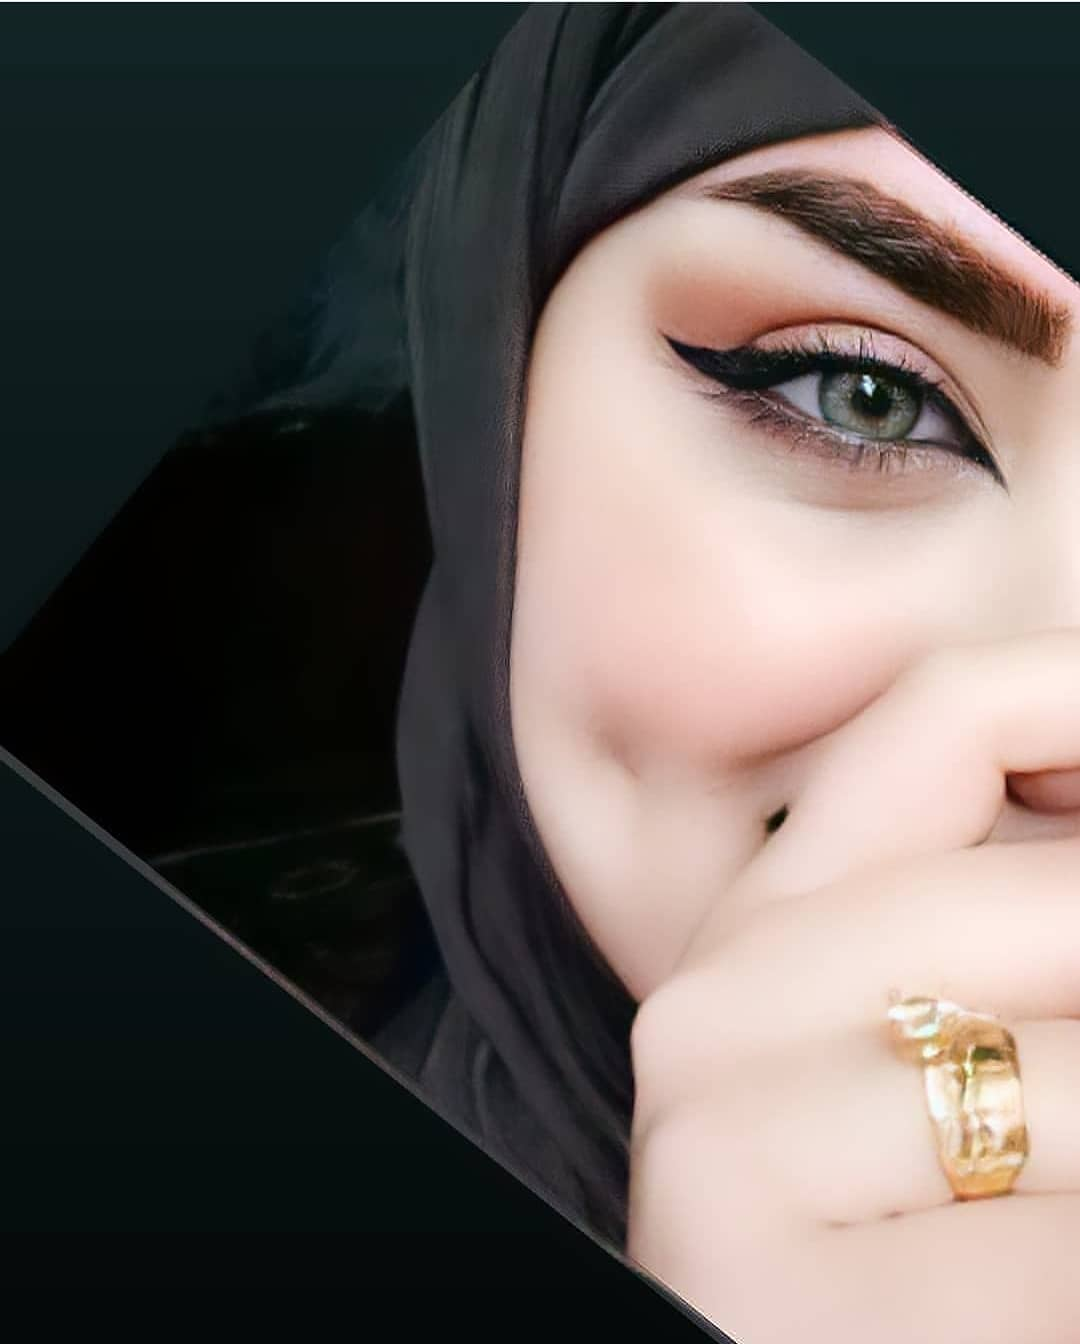 Girls Hijab Style DP for WhatsApp 2021